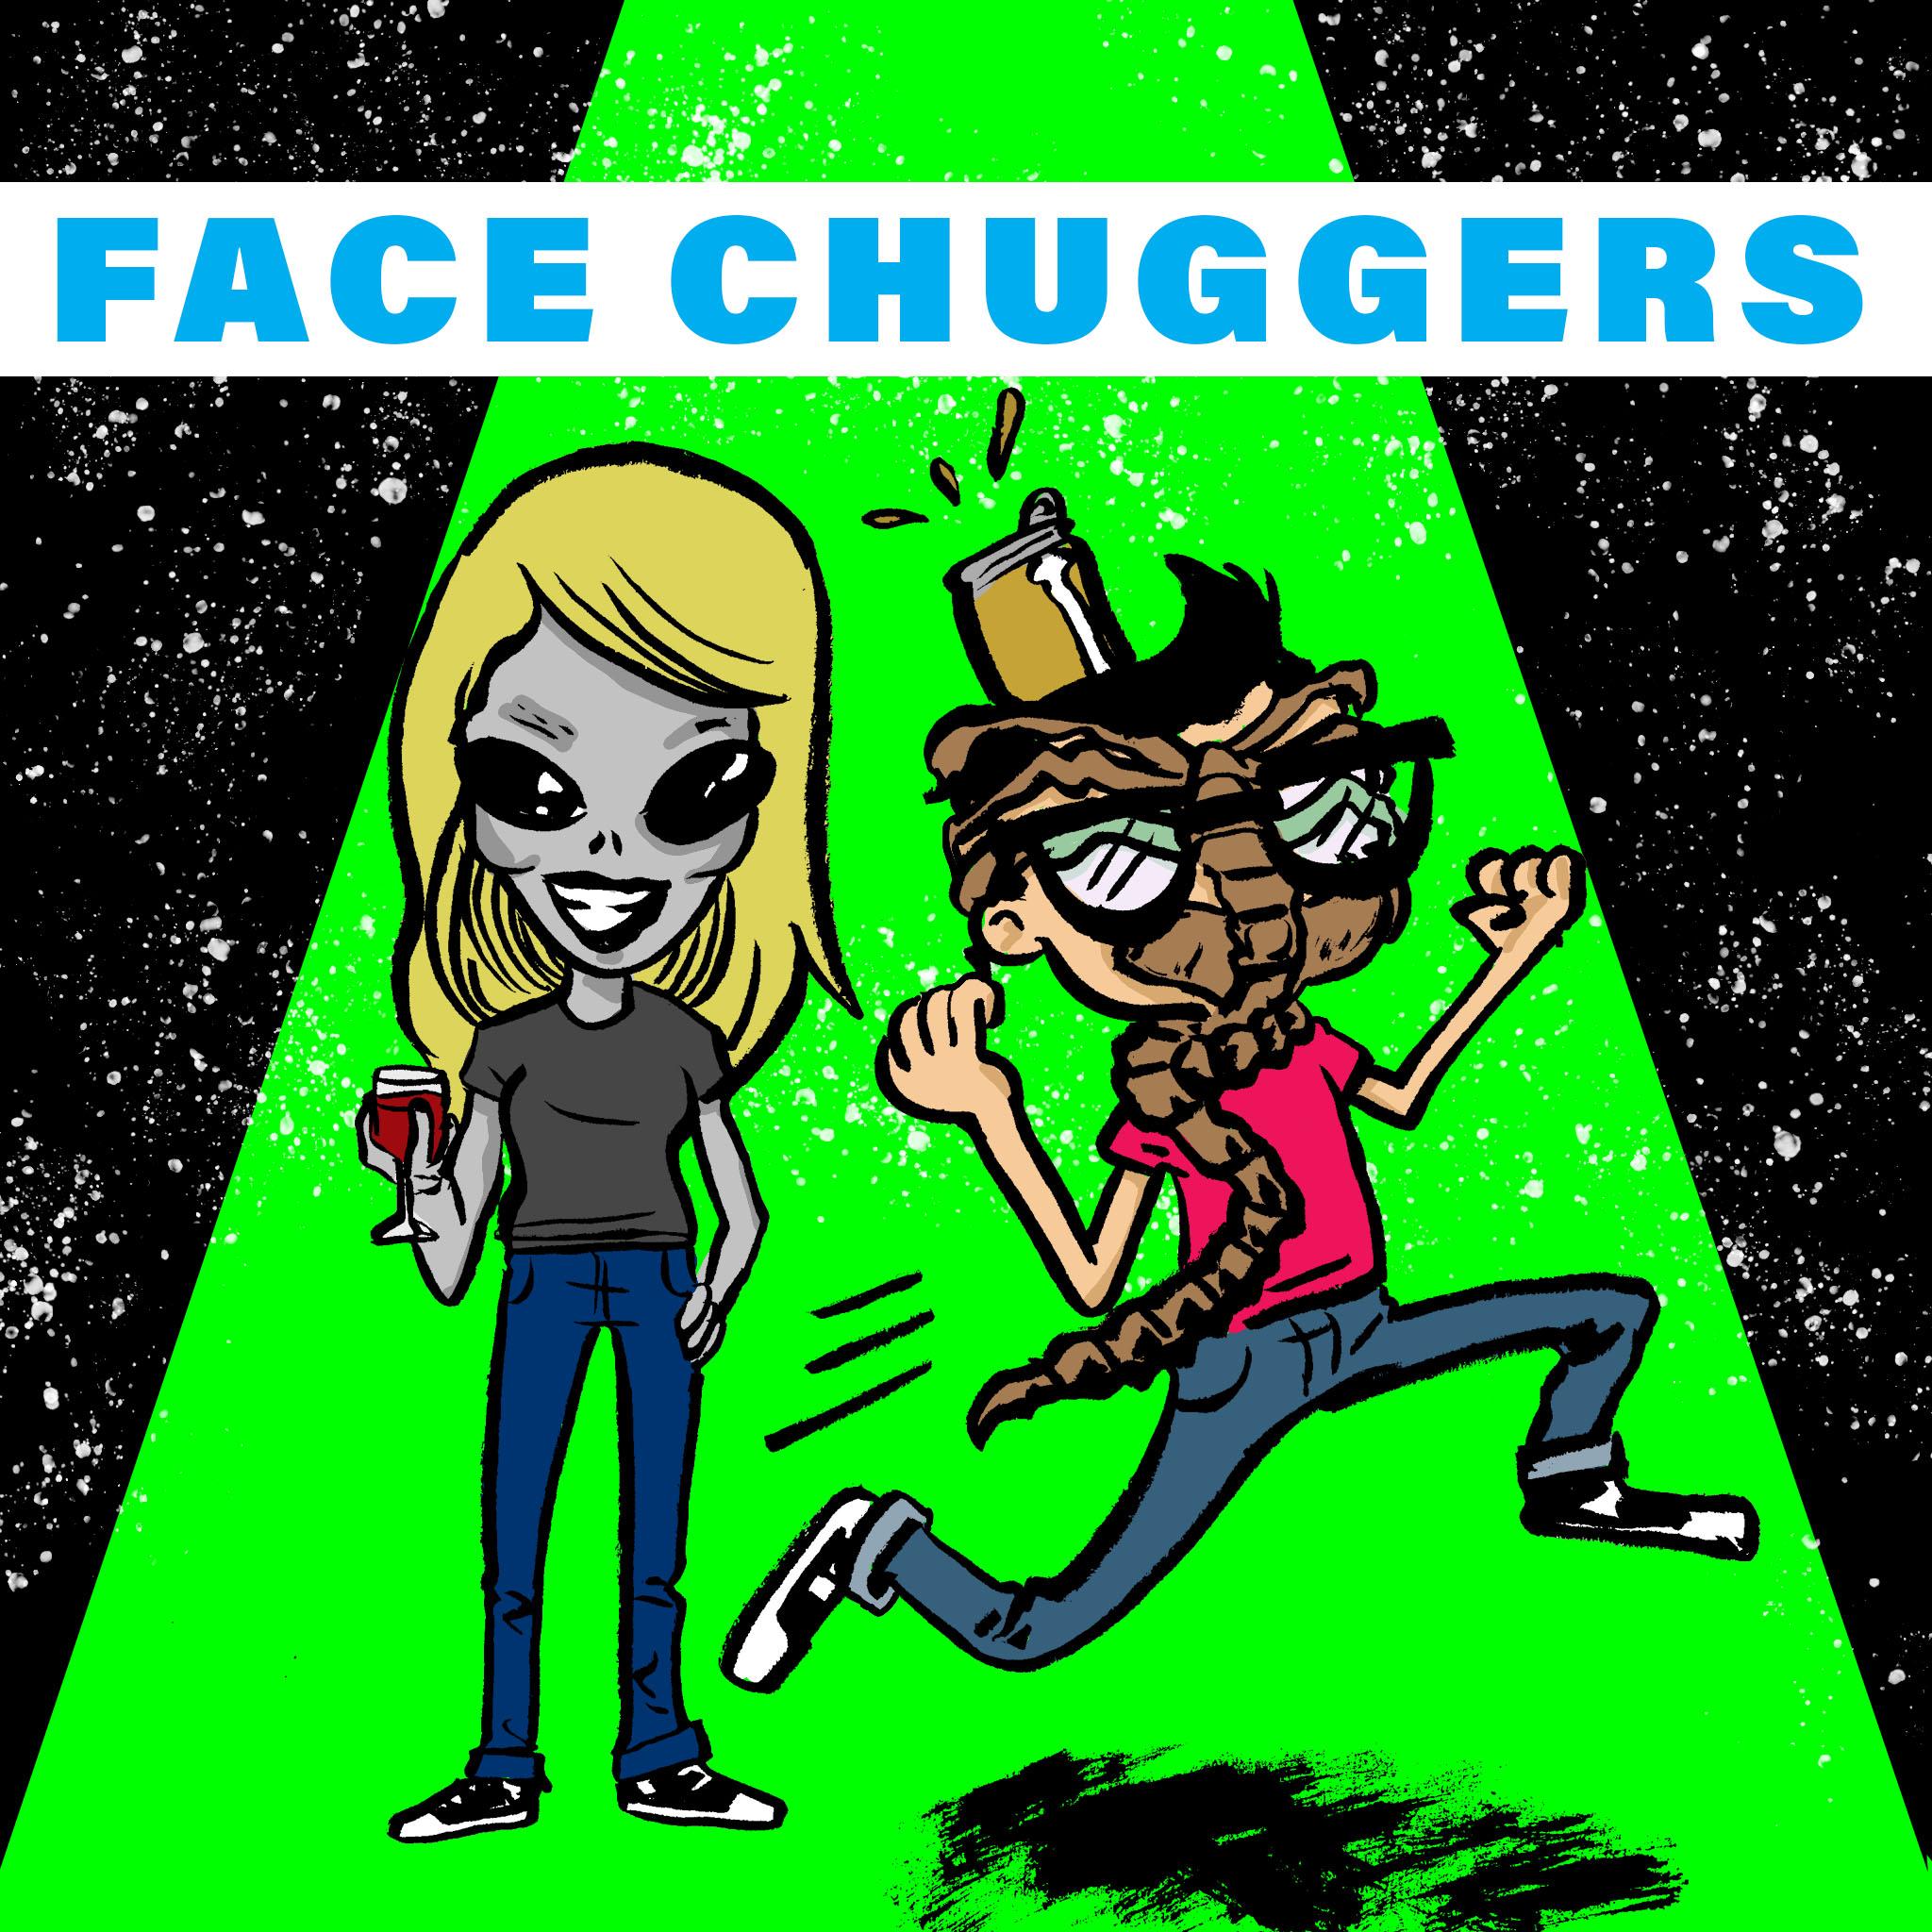 FacechuggersLogo.jpg